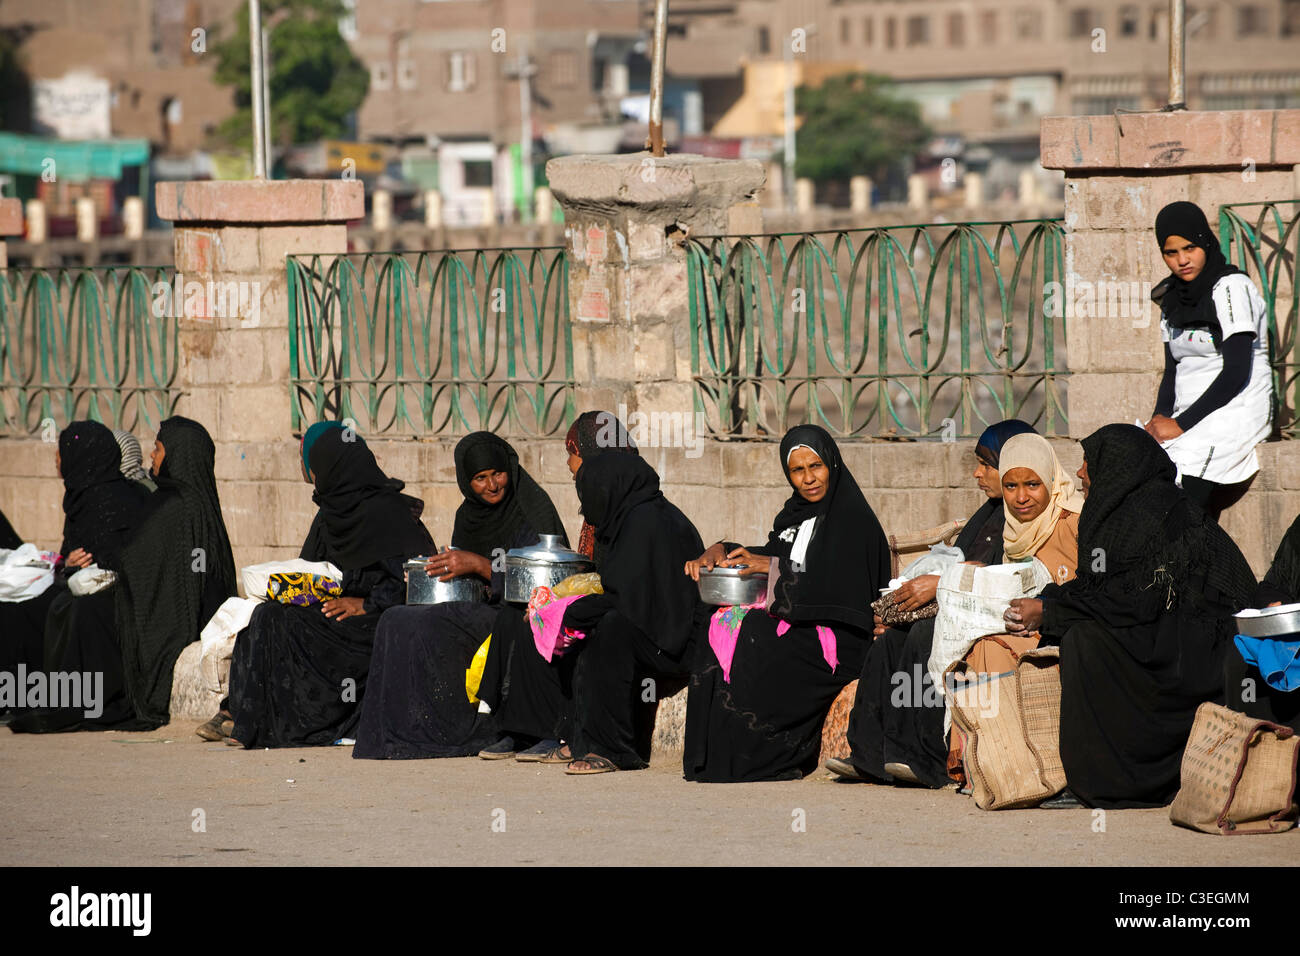 Aegypten, Esna, Strassenszene, Frauen verkaufen Käse - Stock Image